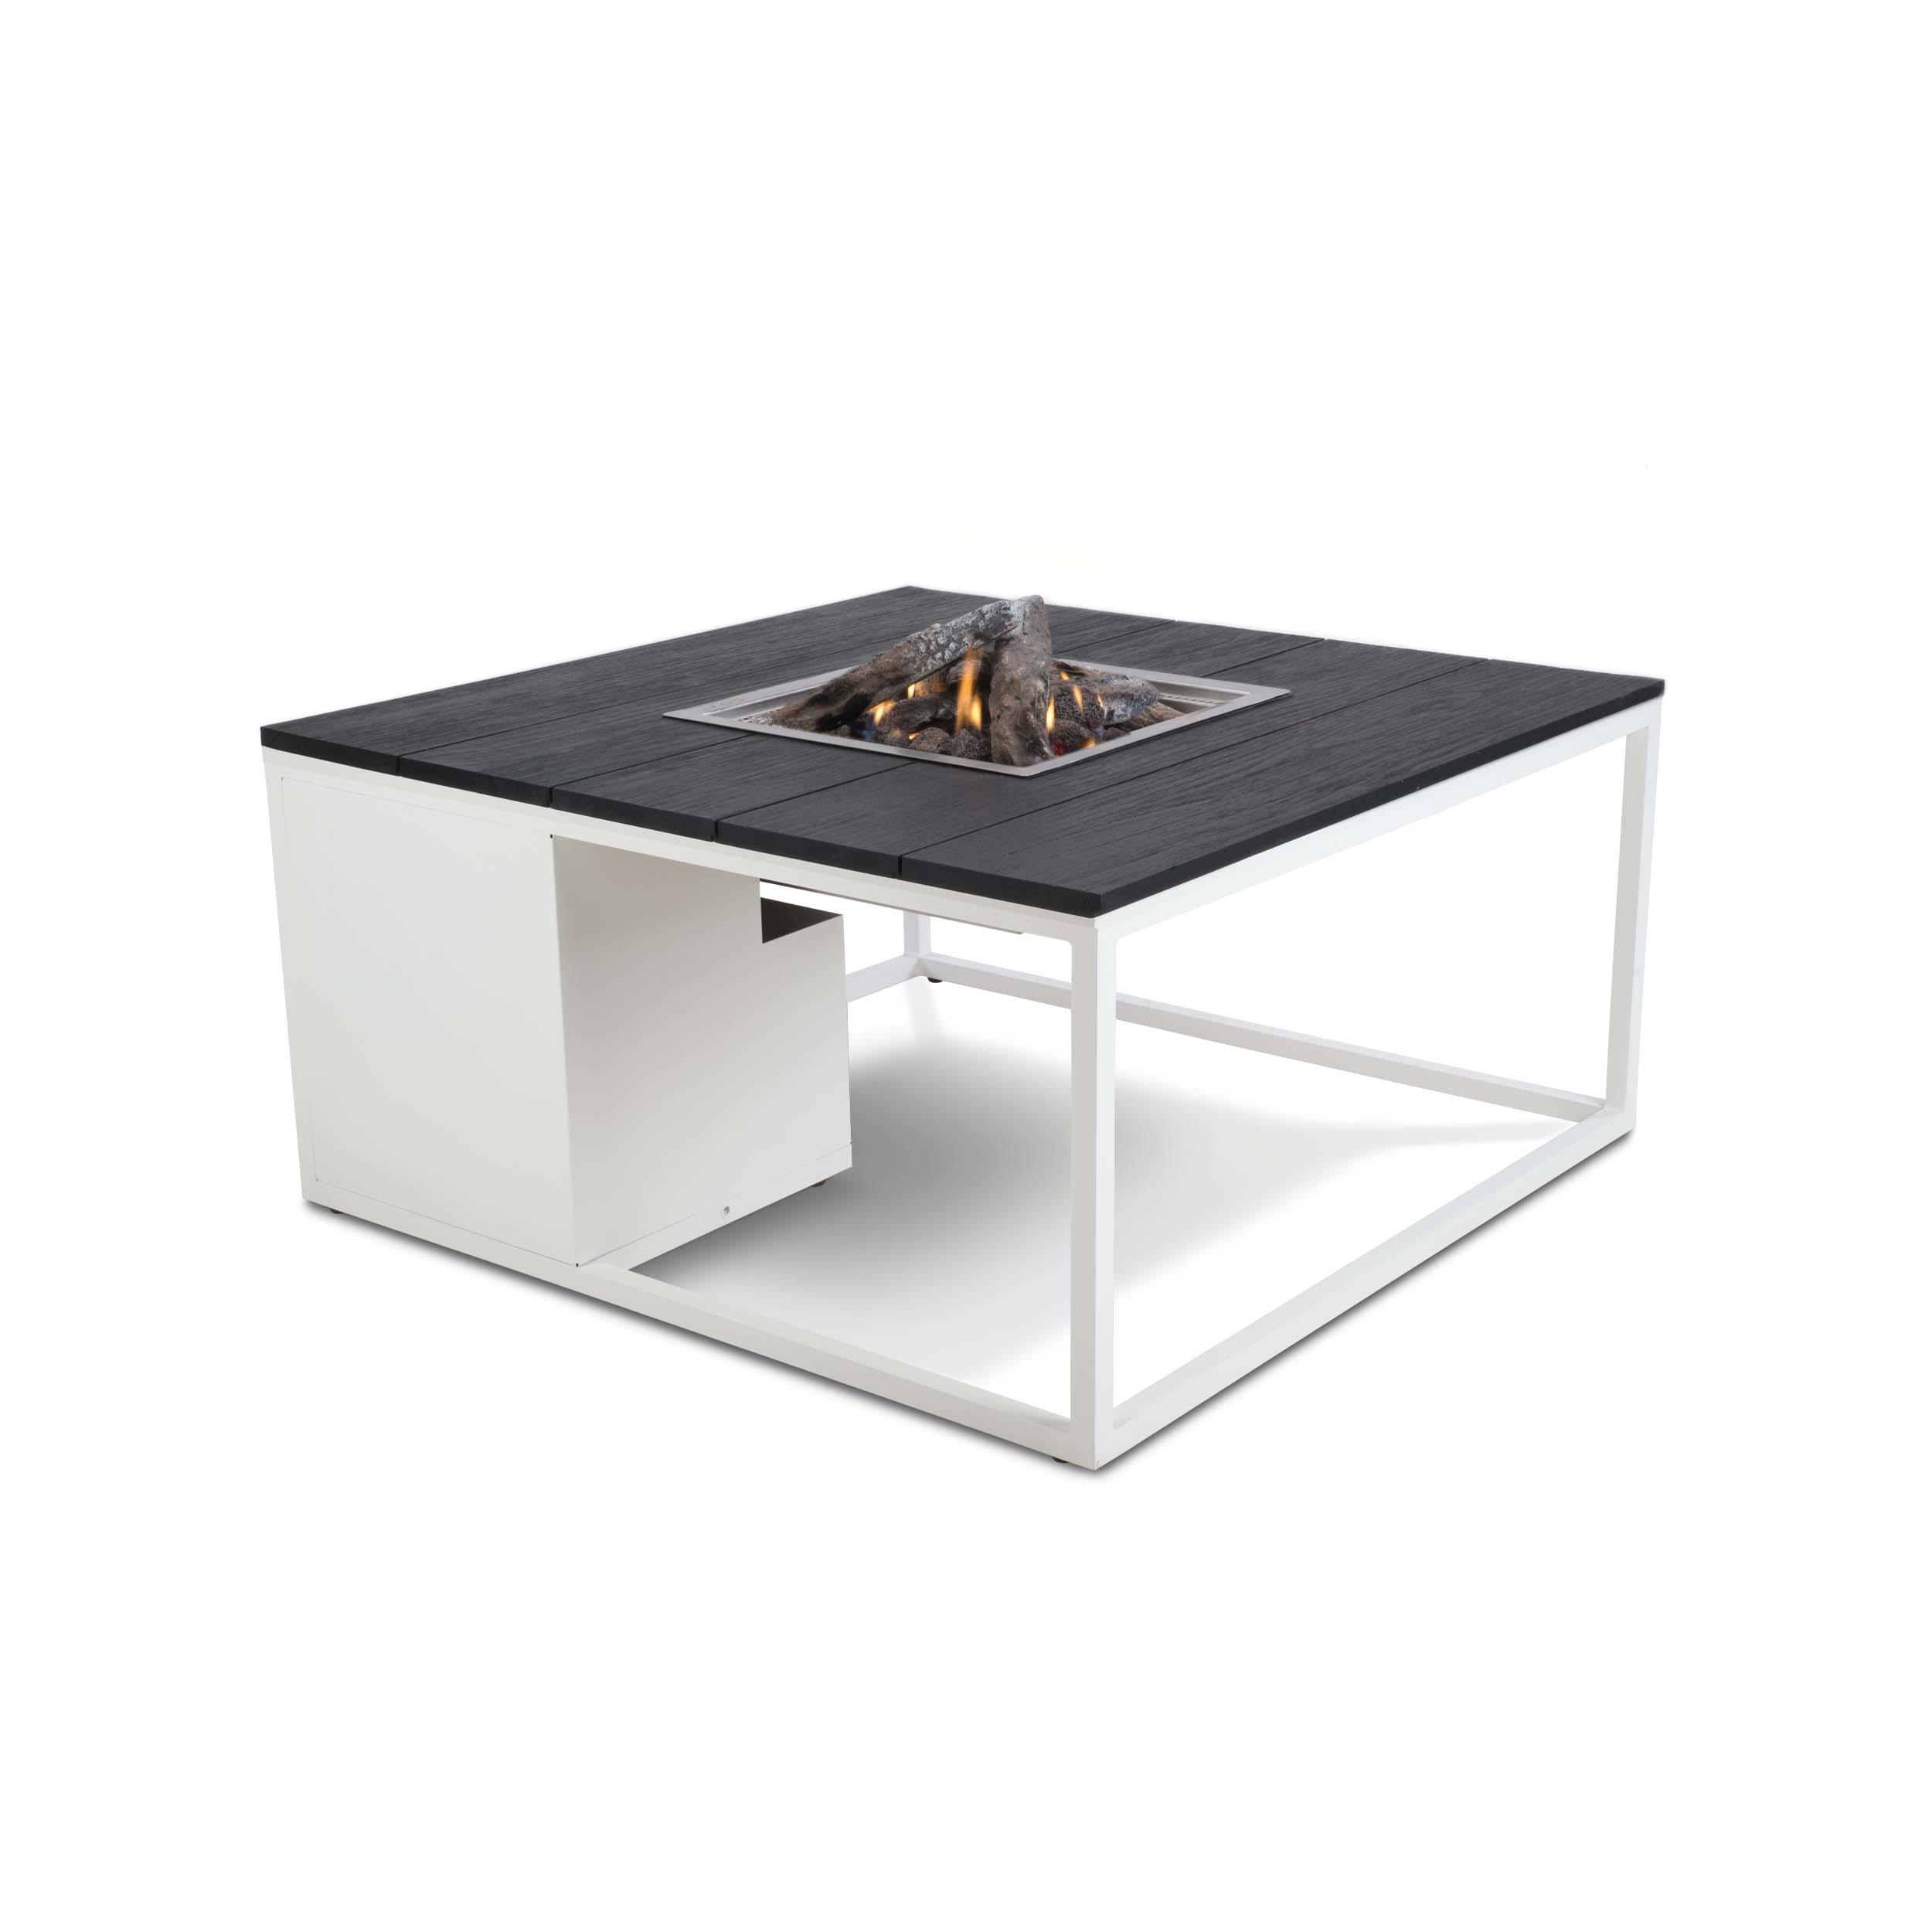 Cosiloft loungebord med gasbrænder – 100x100x47 – hvid/sort